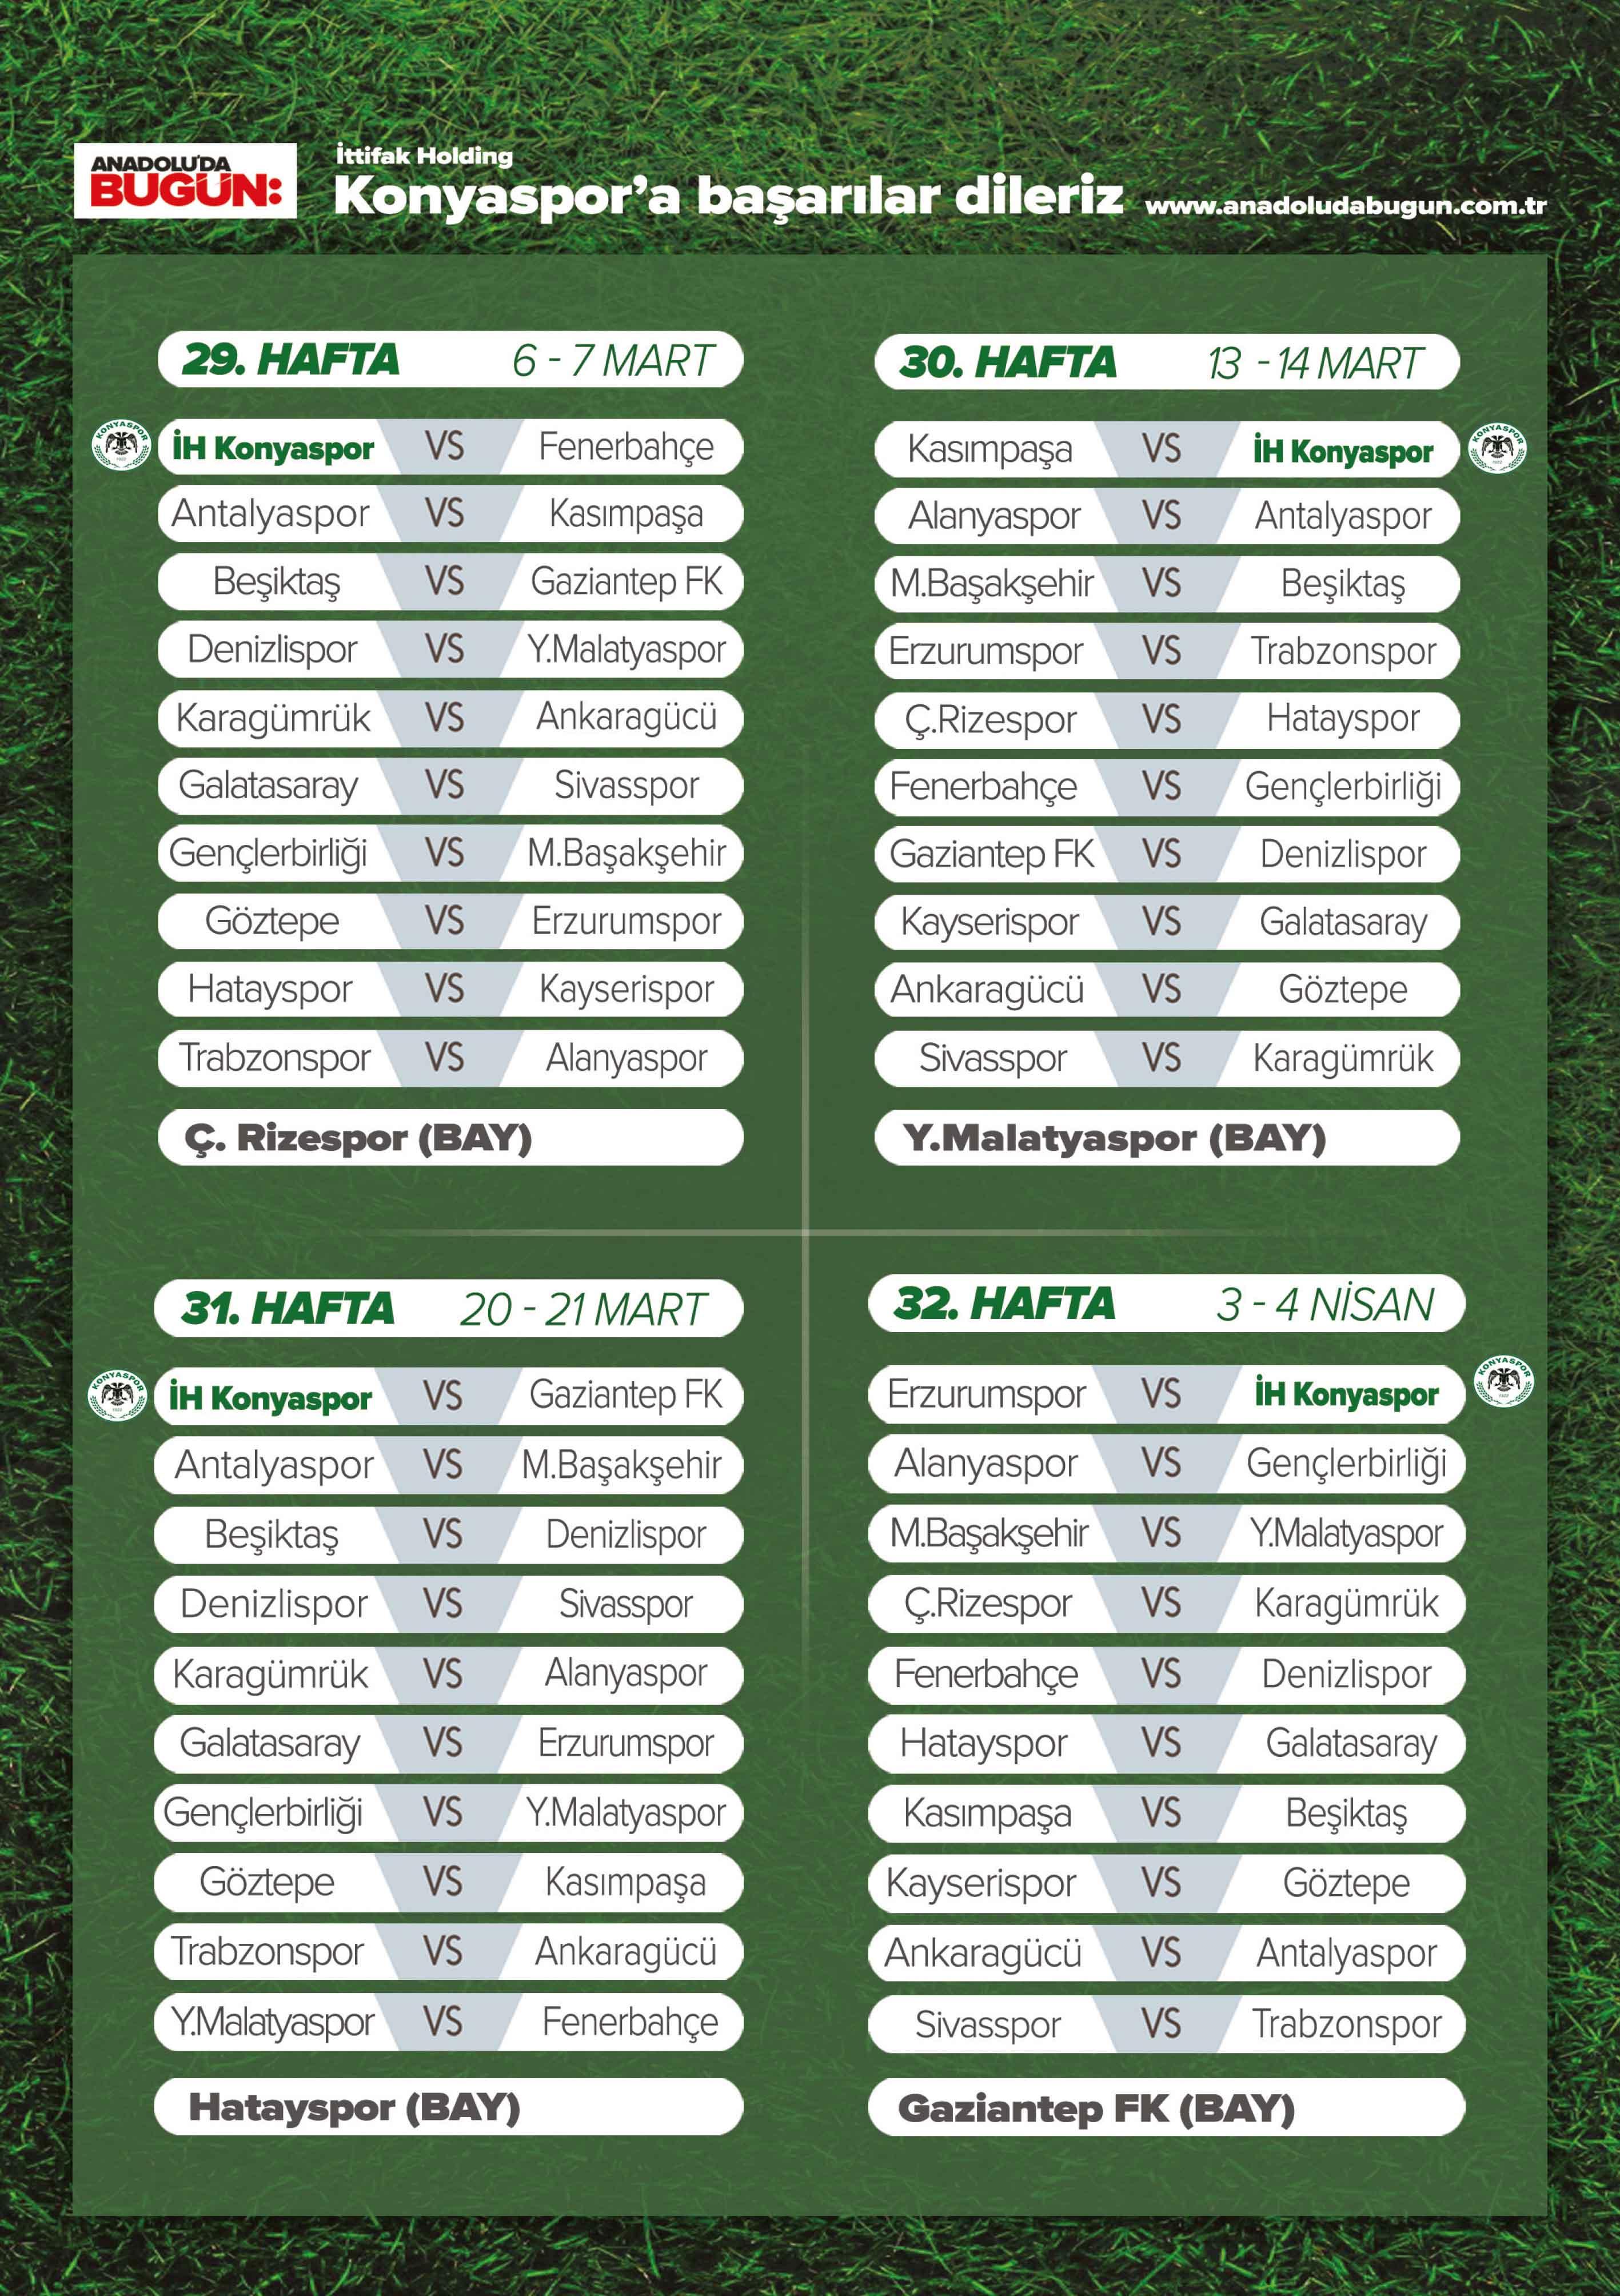 ih-konyaspor-2020-2021-fiksturu-021.jpg